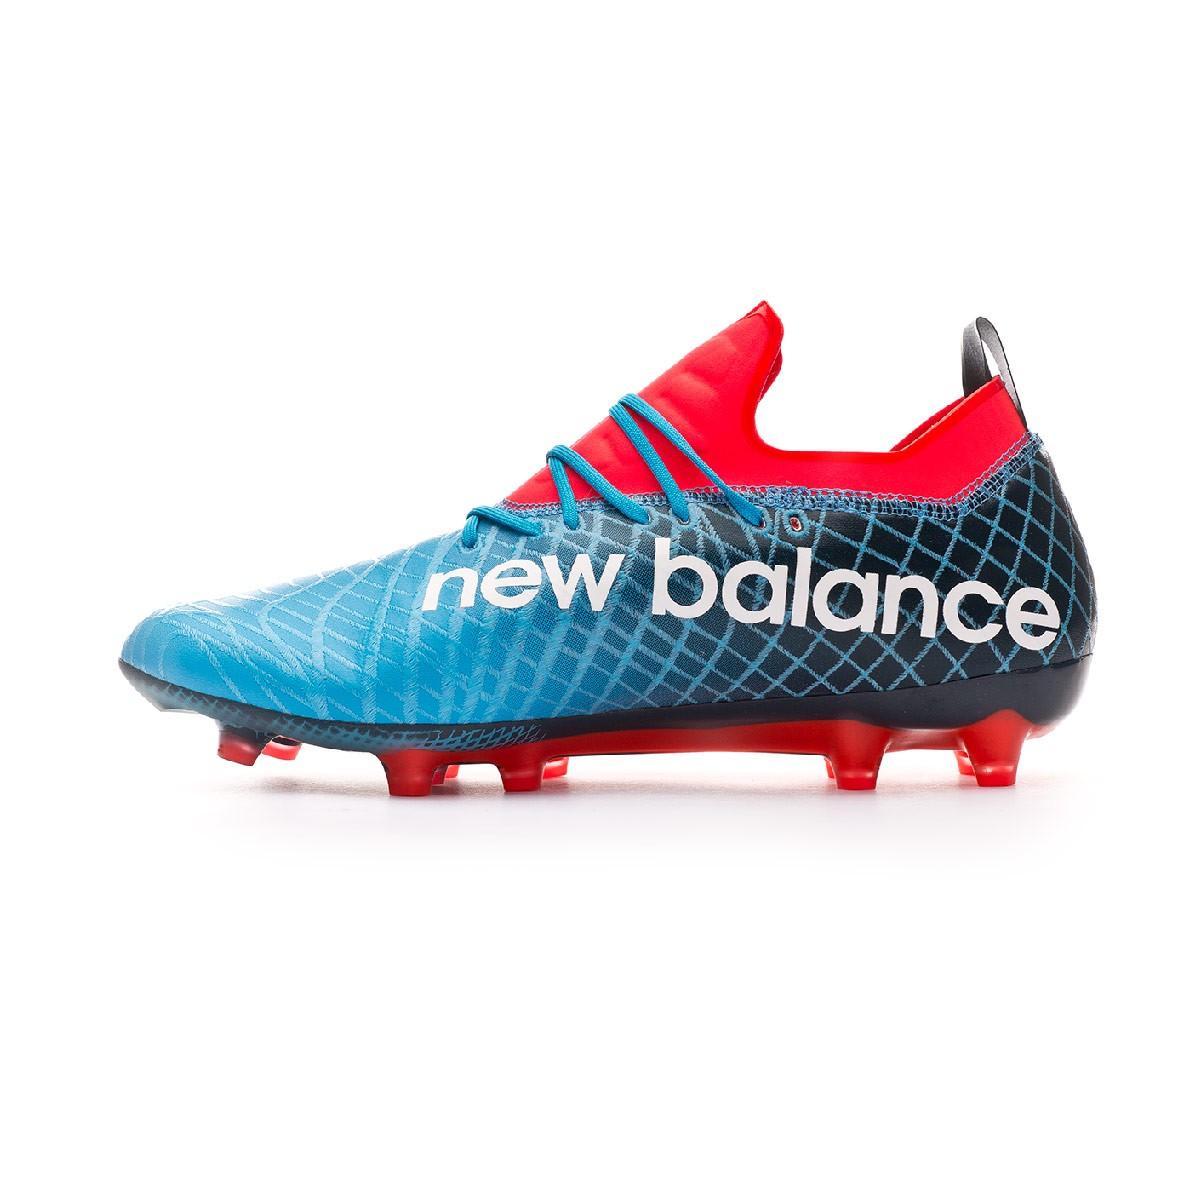 487d9d92c8c83 Scarpe New Balance Tekela 1.0 Pro FG Galaxy blue - Negozio di calcio Fútbol  Emotion